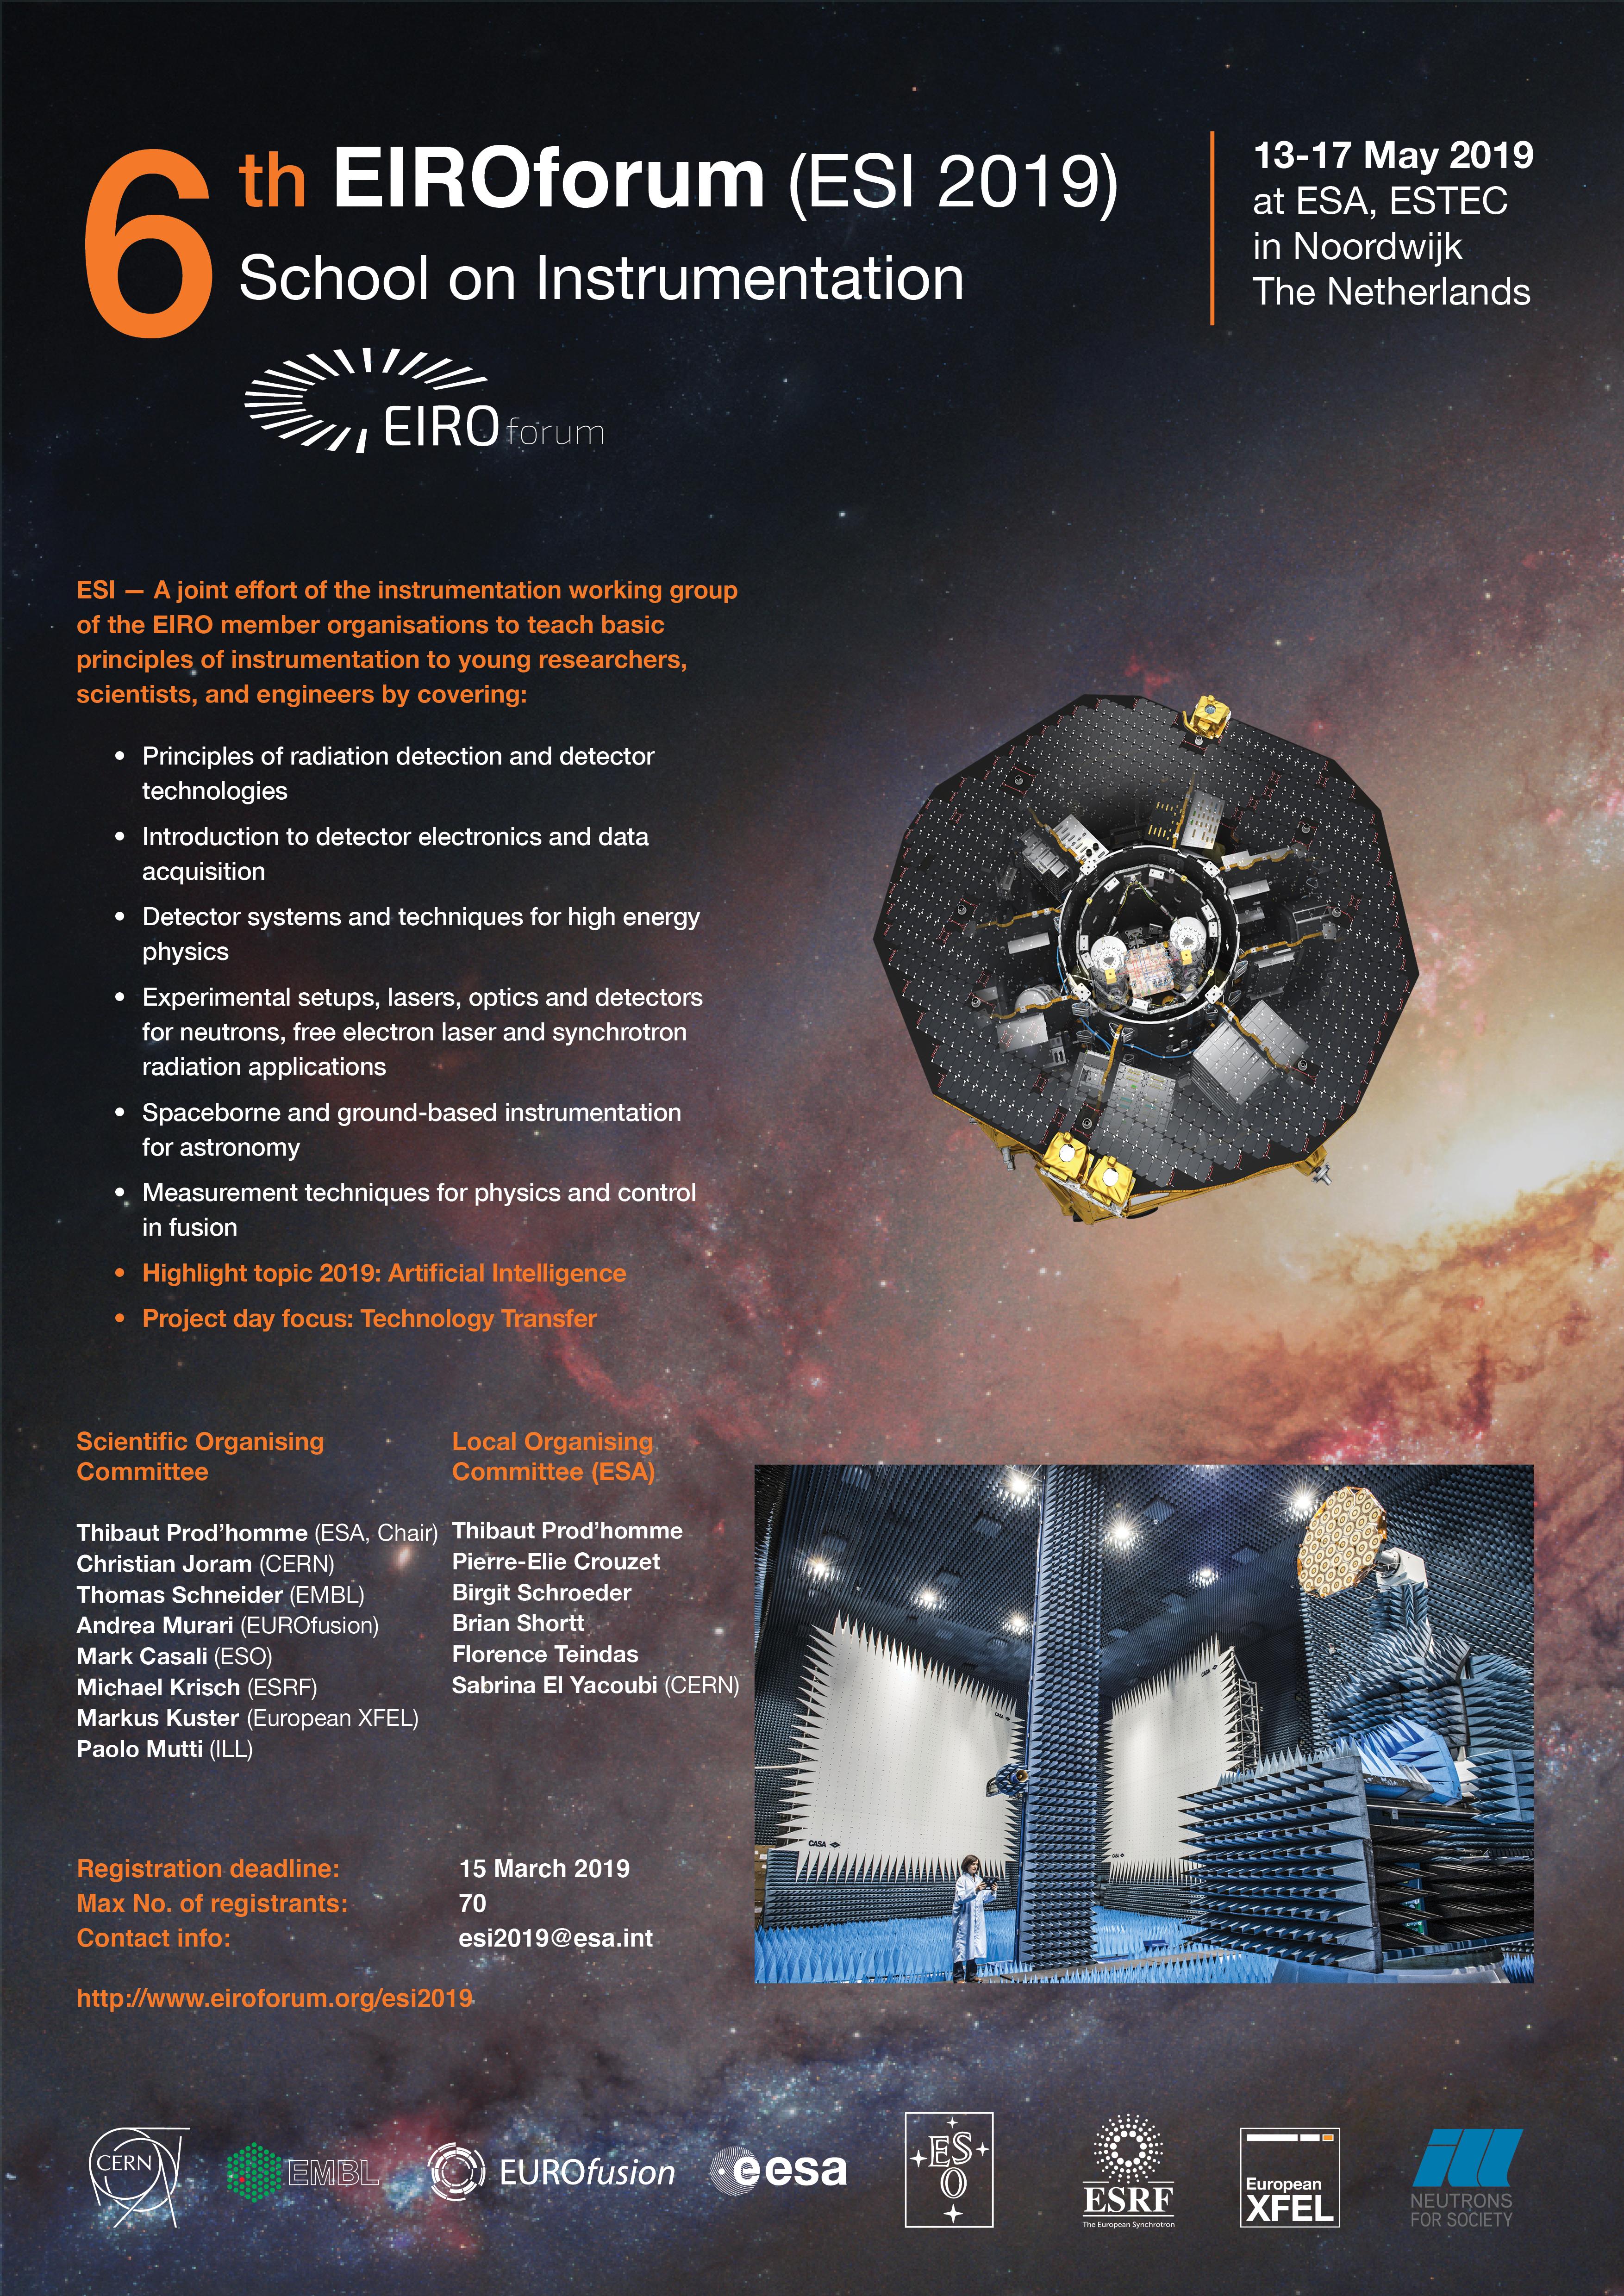 6th EIROforum School on Instrumentation (13-17 May 2019